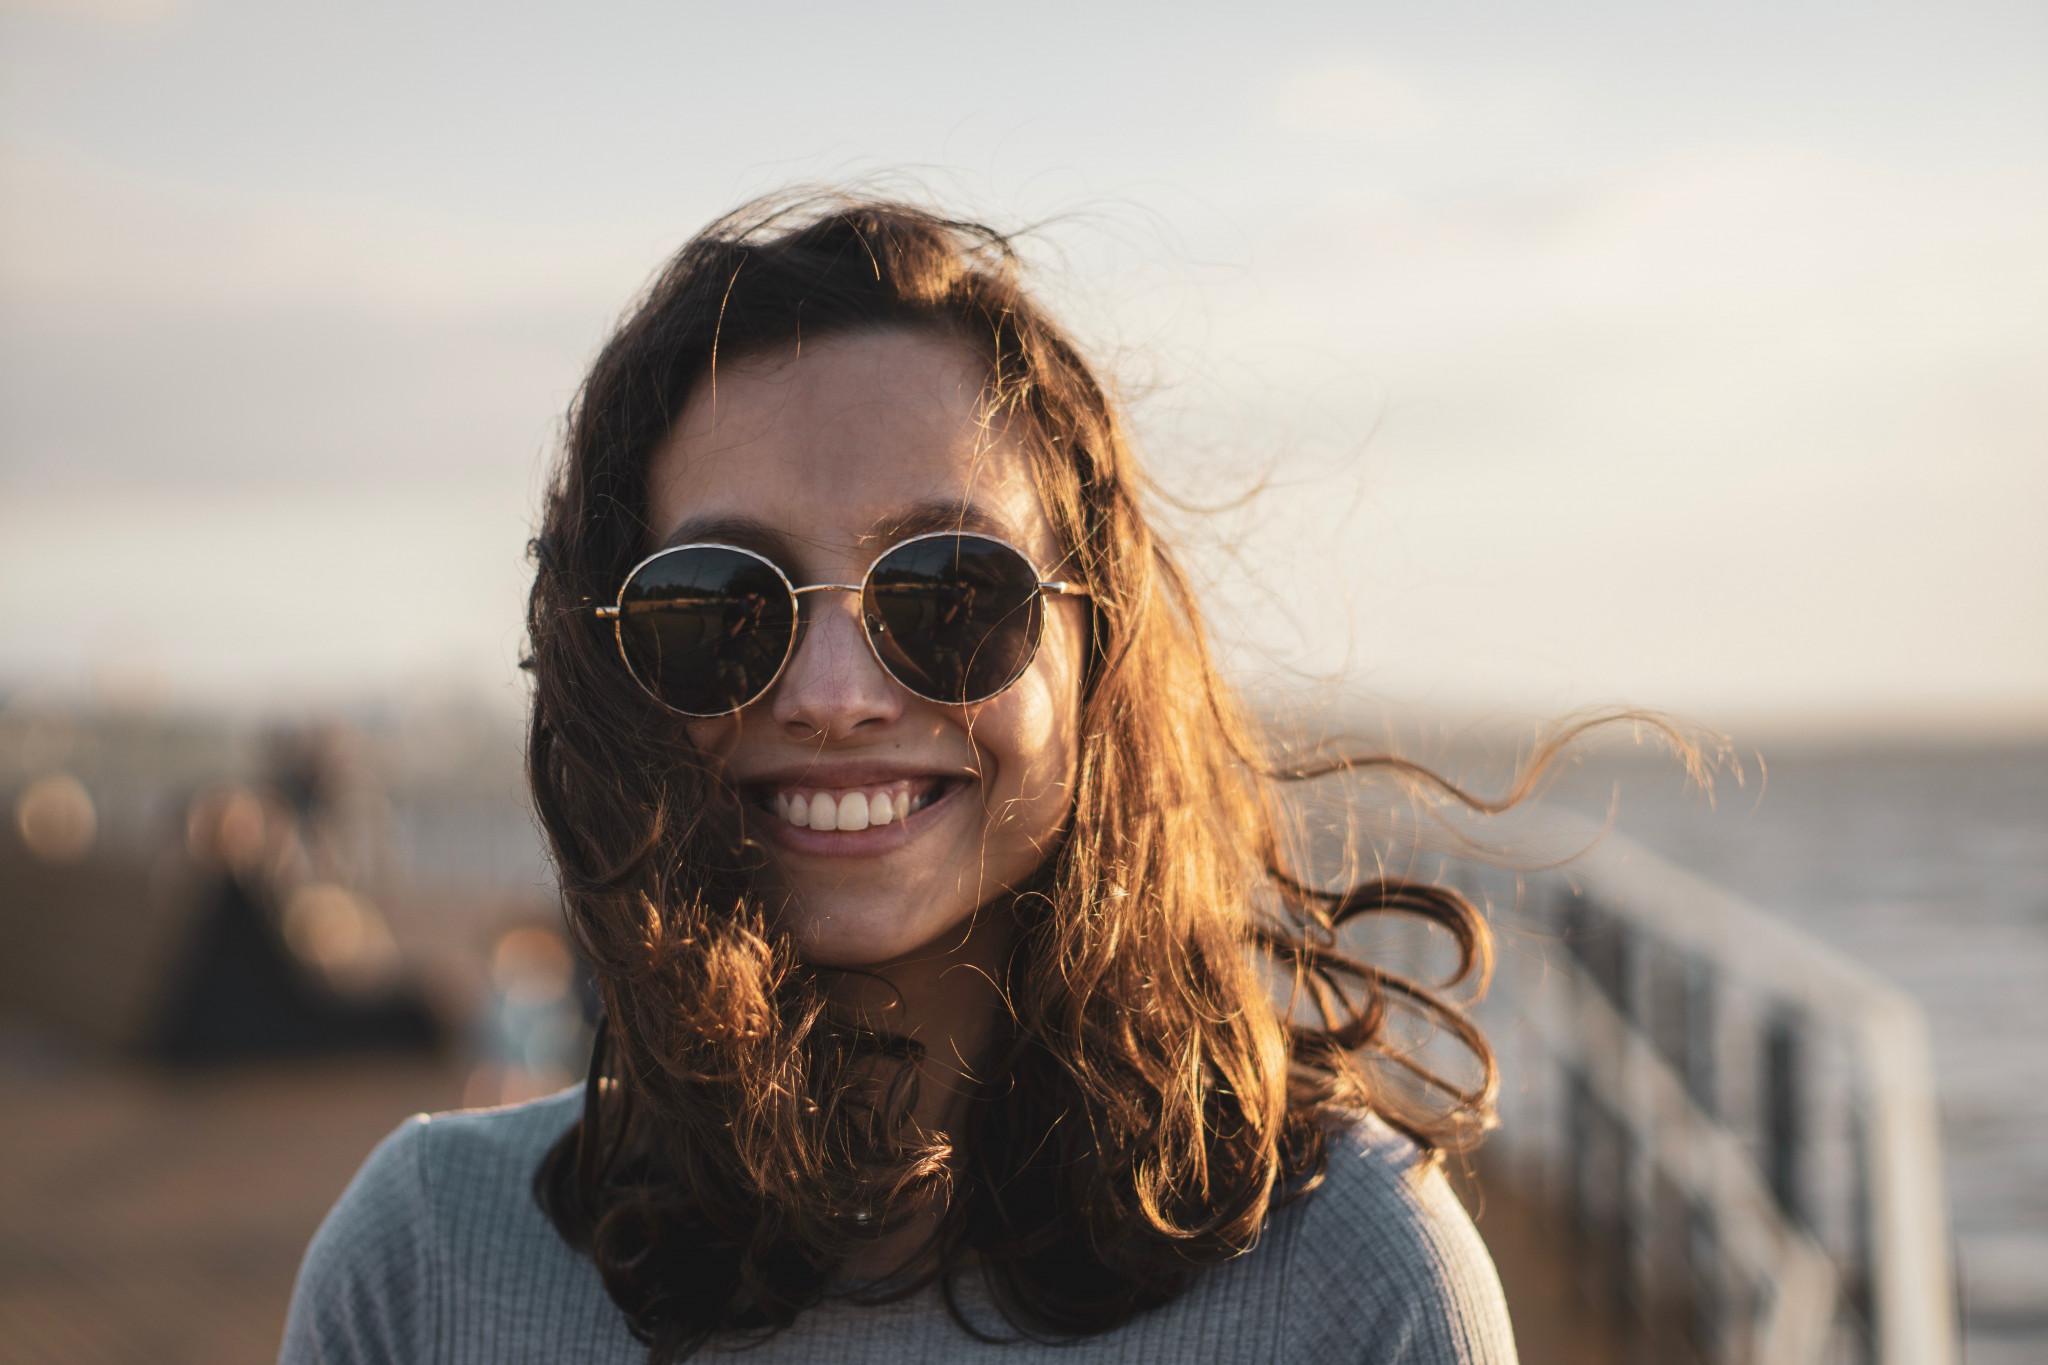 Ung kvinna med solglasögon ler med kust i bakgrunden.